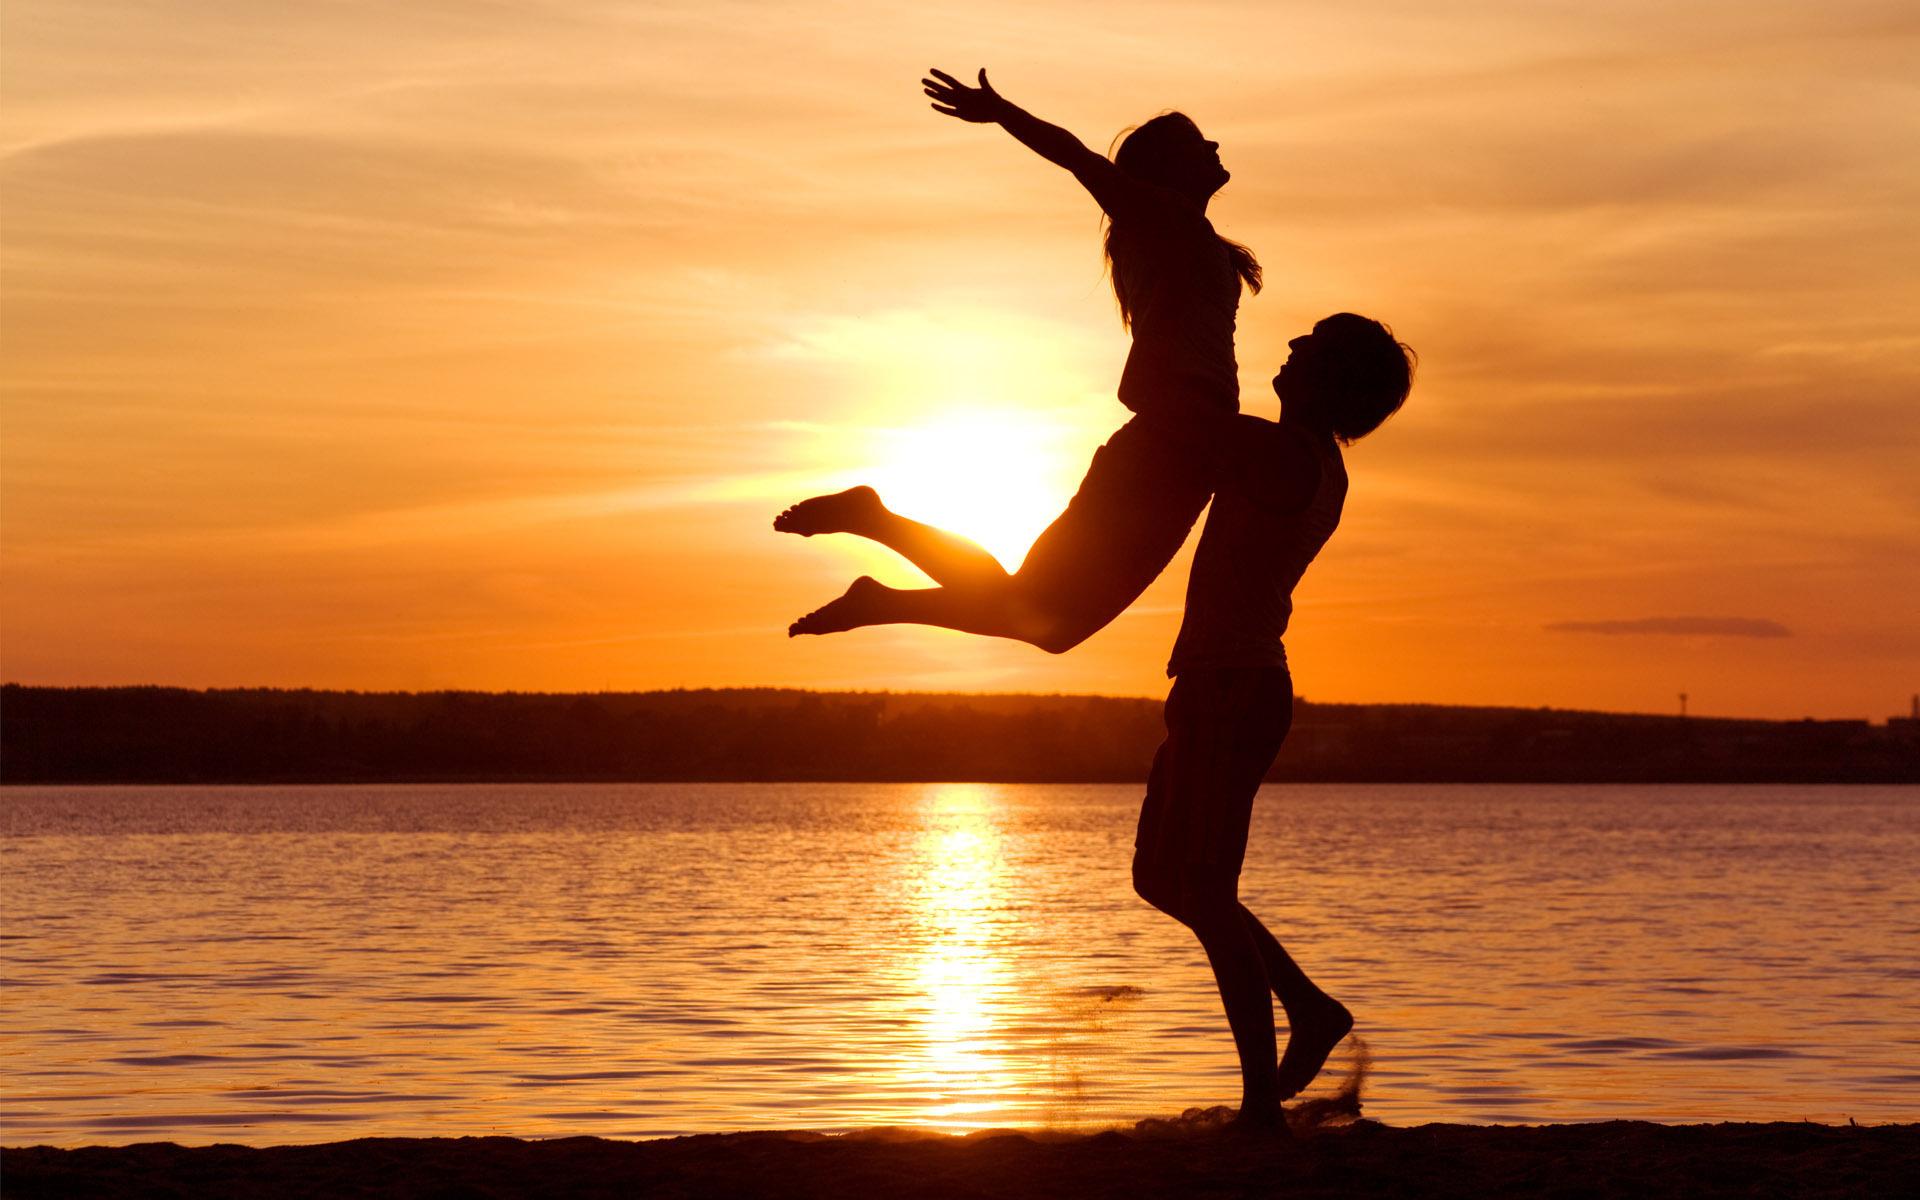 love-man-woman-silhouette-sun-sunset-sea-lake-beach